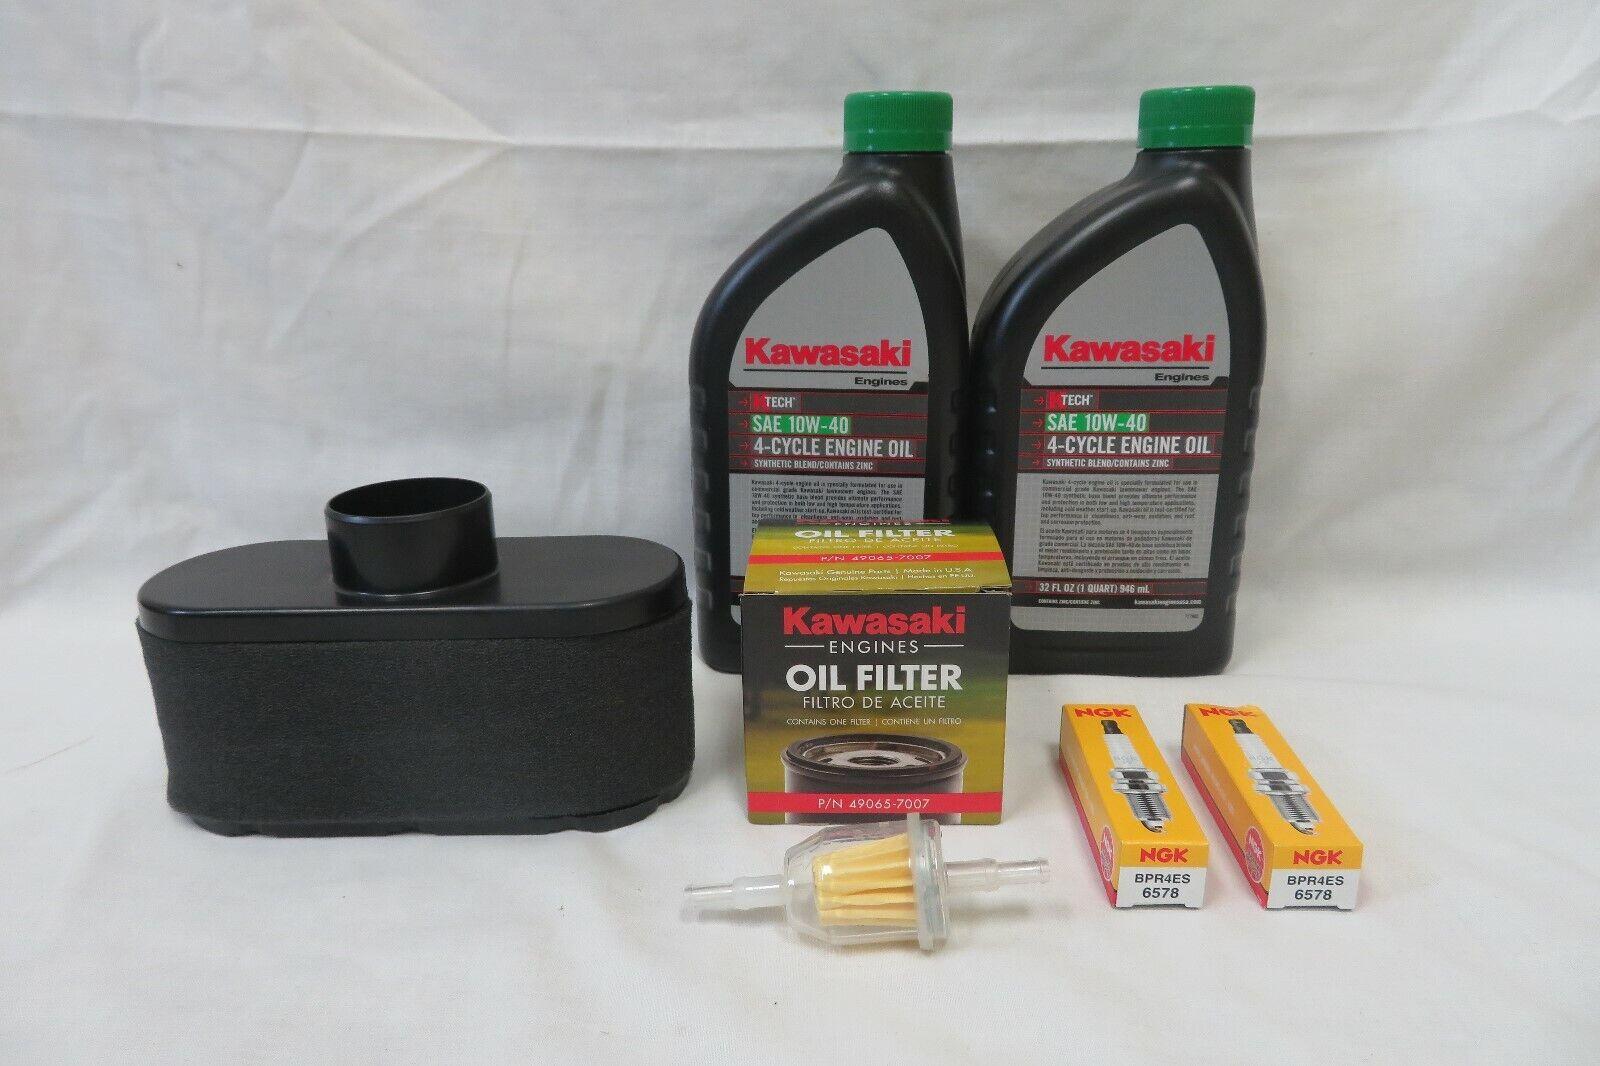 Kit de servicio de mantenimiento Kawasaki para FR651V, FR691V, FR730V y todos FS Series